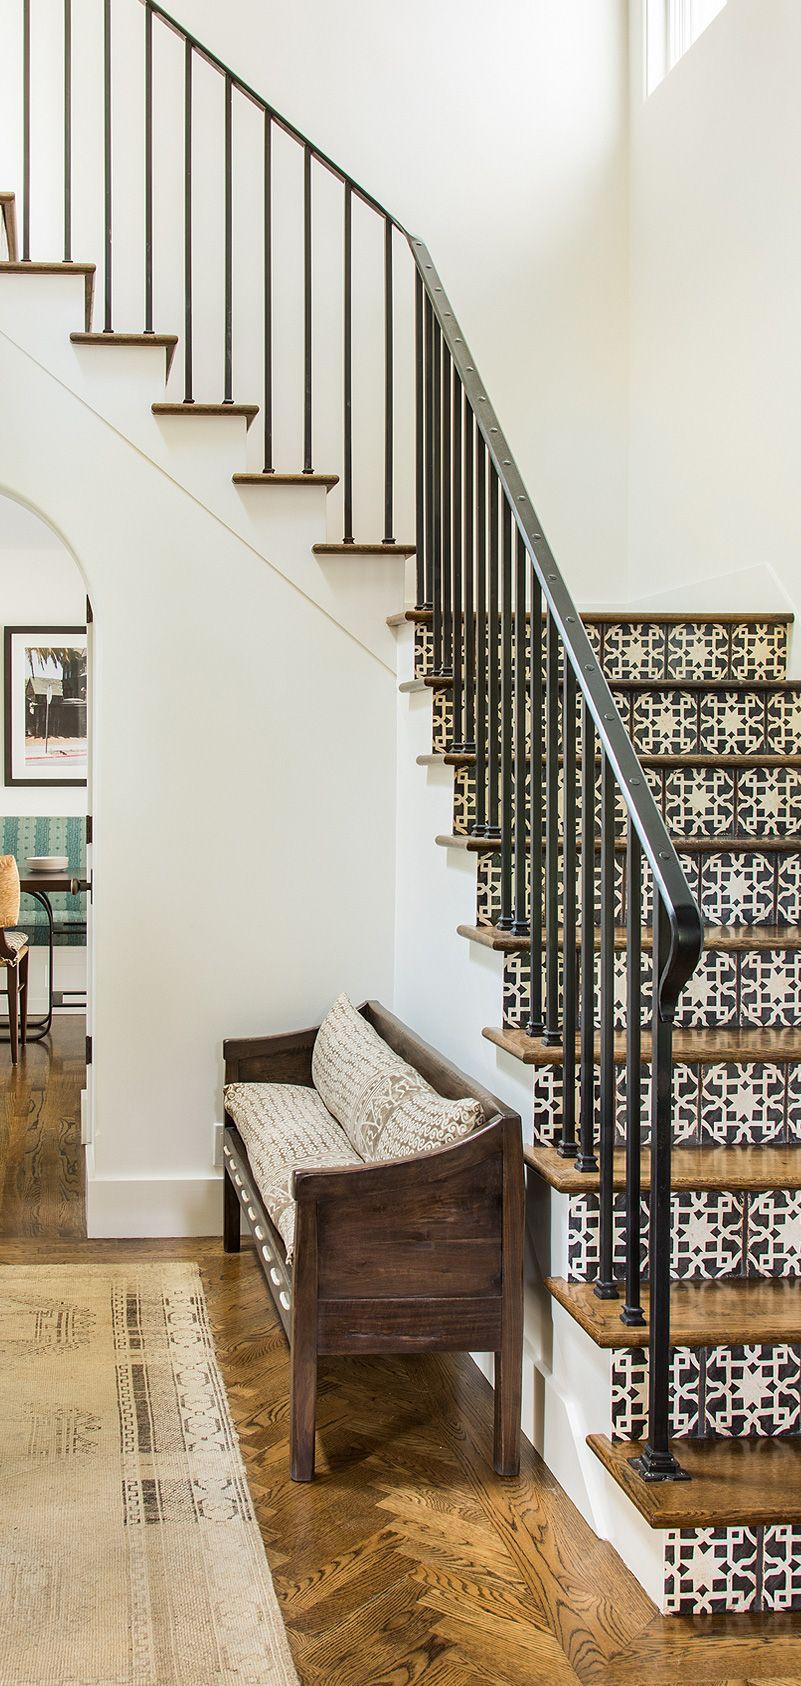 Home interior railings jute home  interior design san francisco bay area los angeles